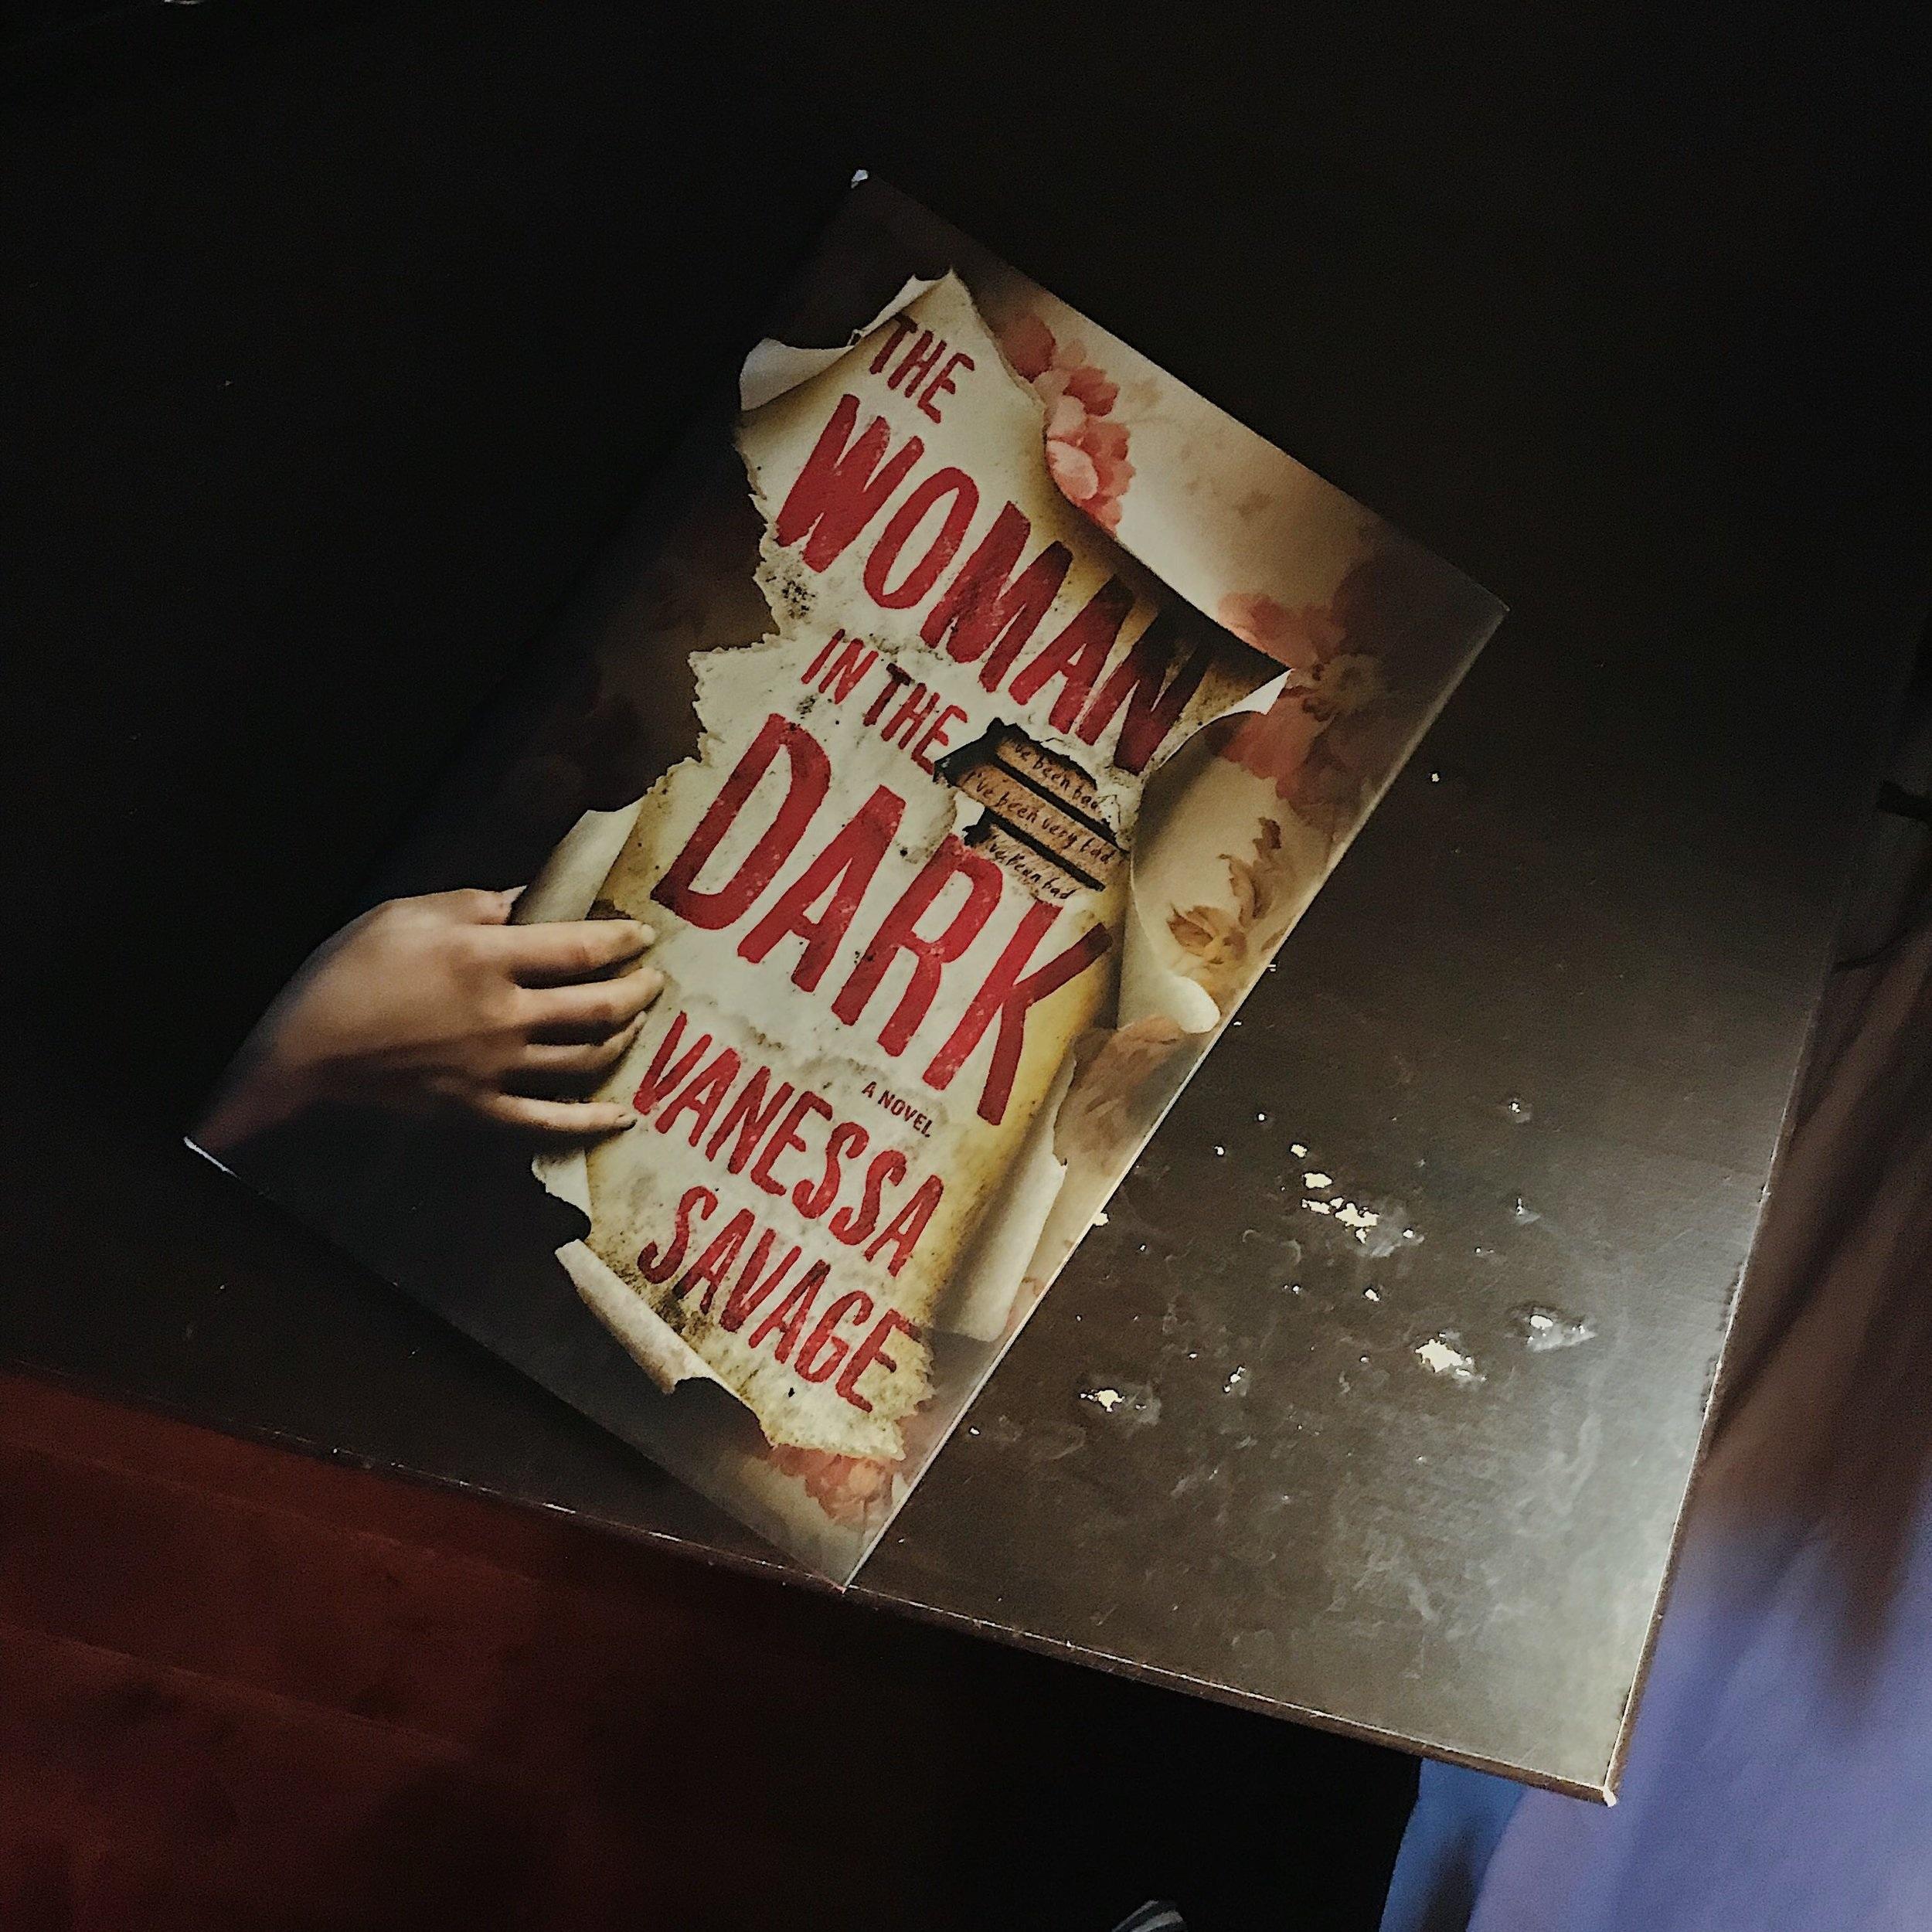 the+women+in+the+dark